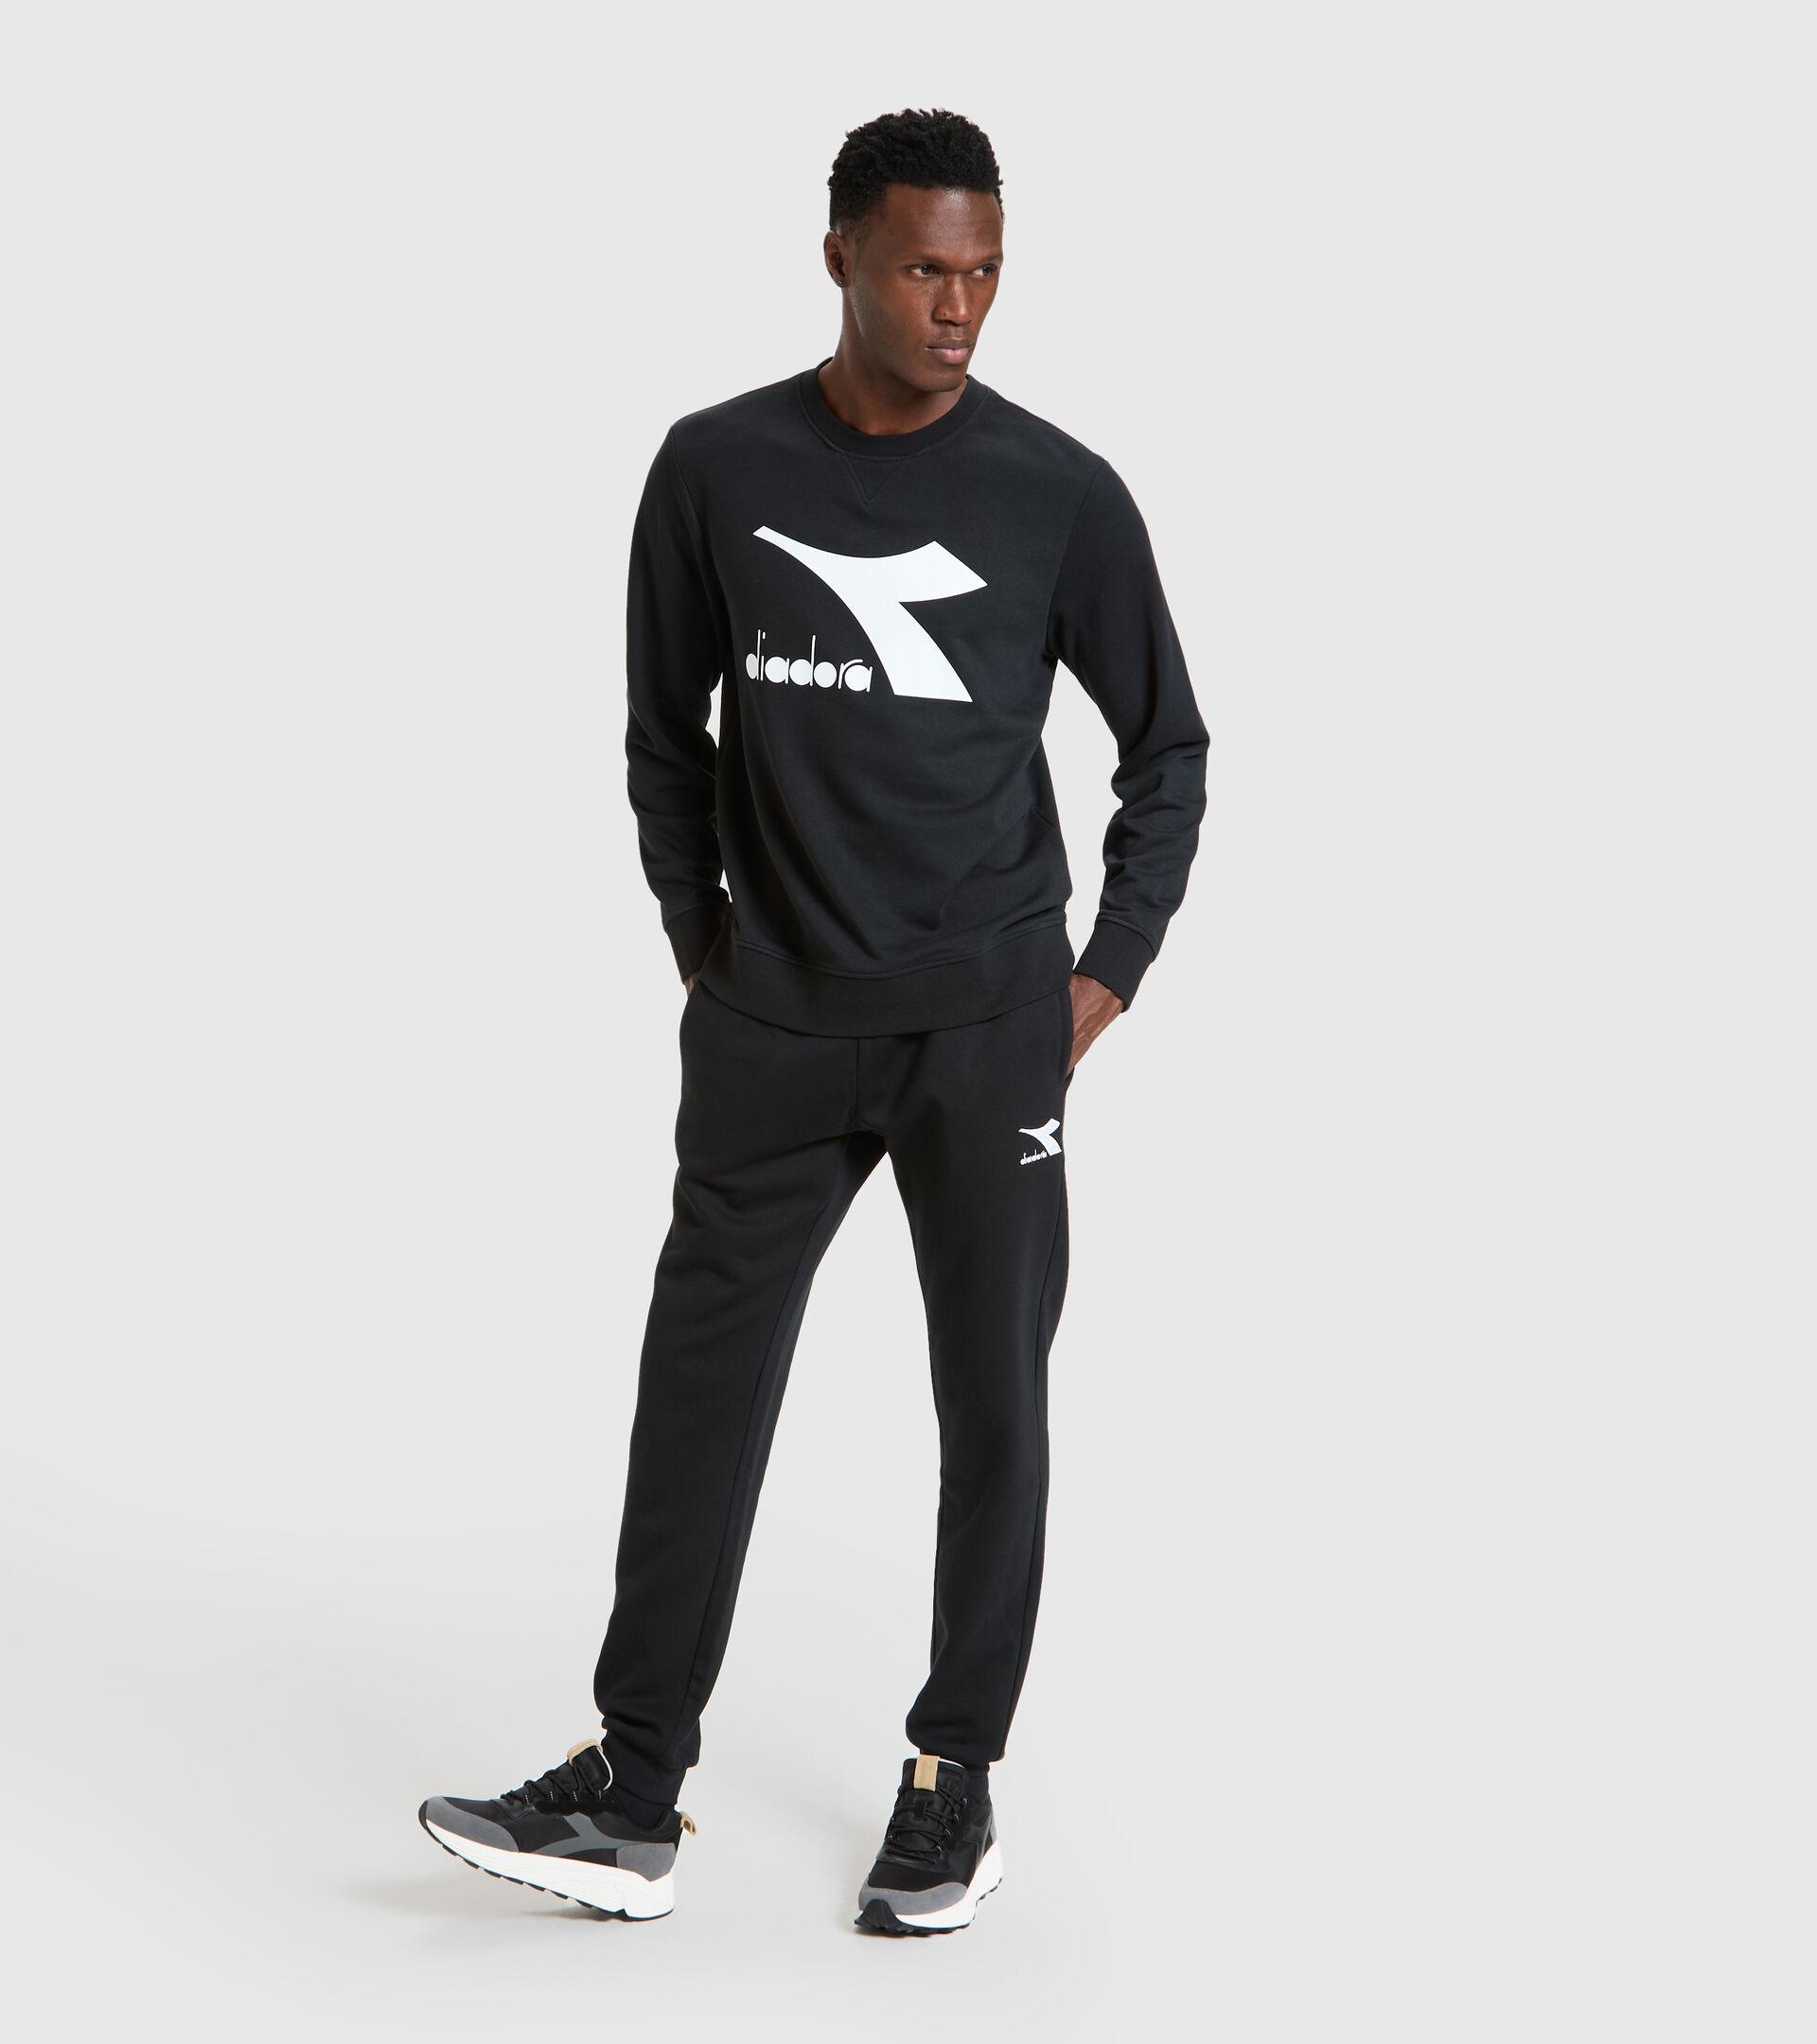 Crew-neck sweatshirt - Men SWEATSHIRT CREW LOGO CHROMIA BLACK - Diadora